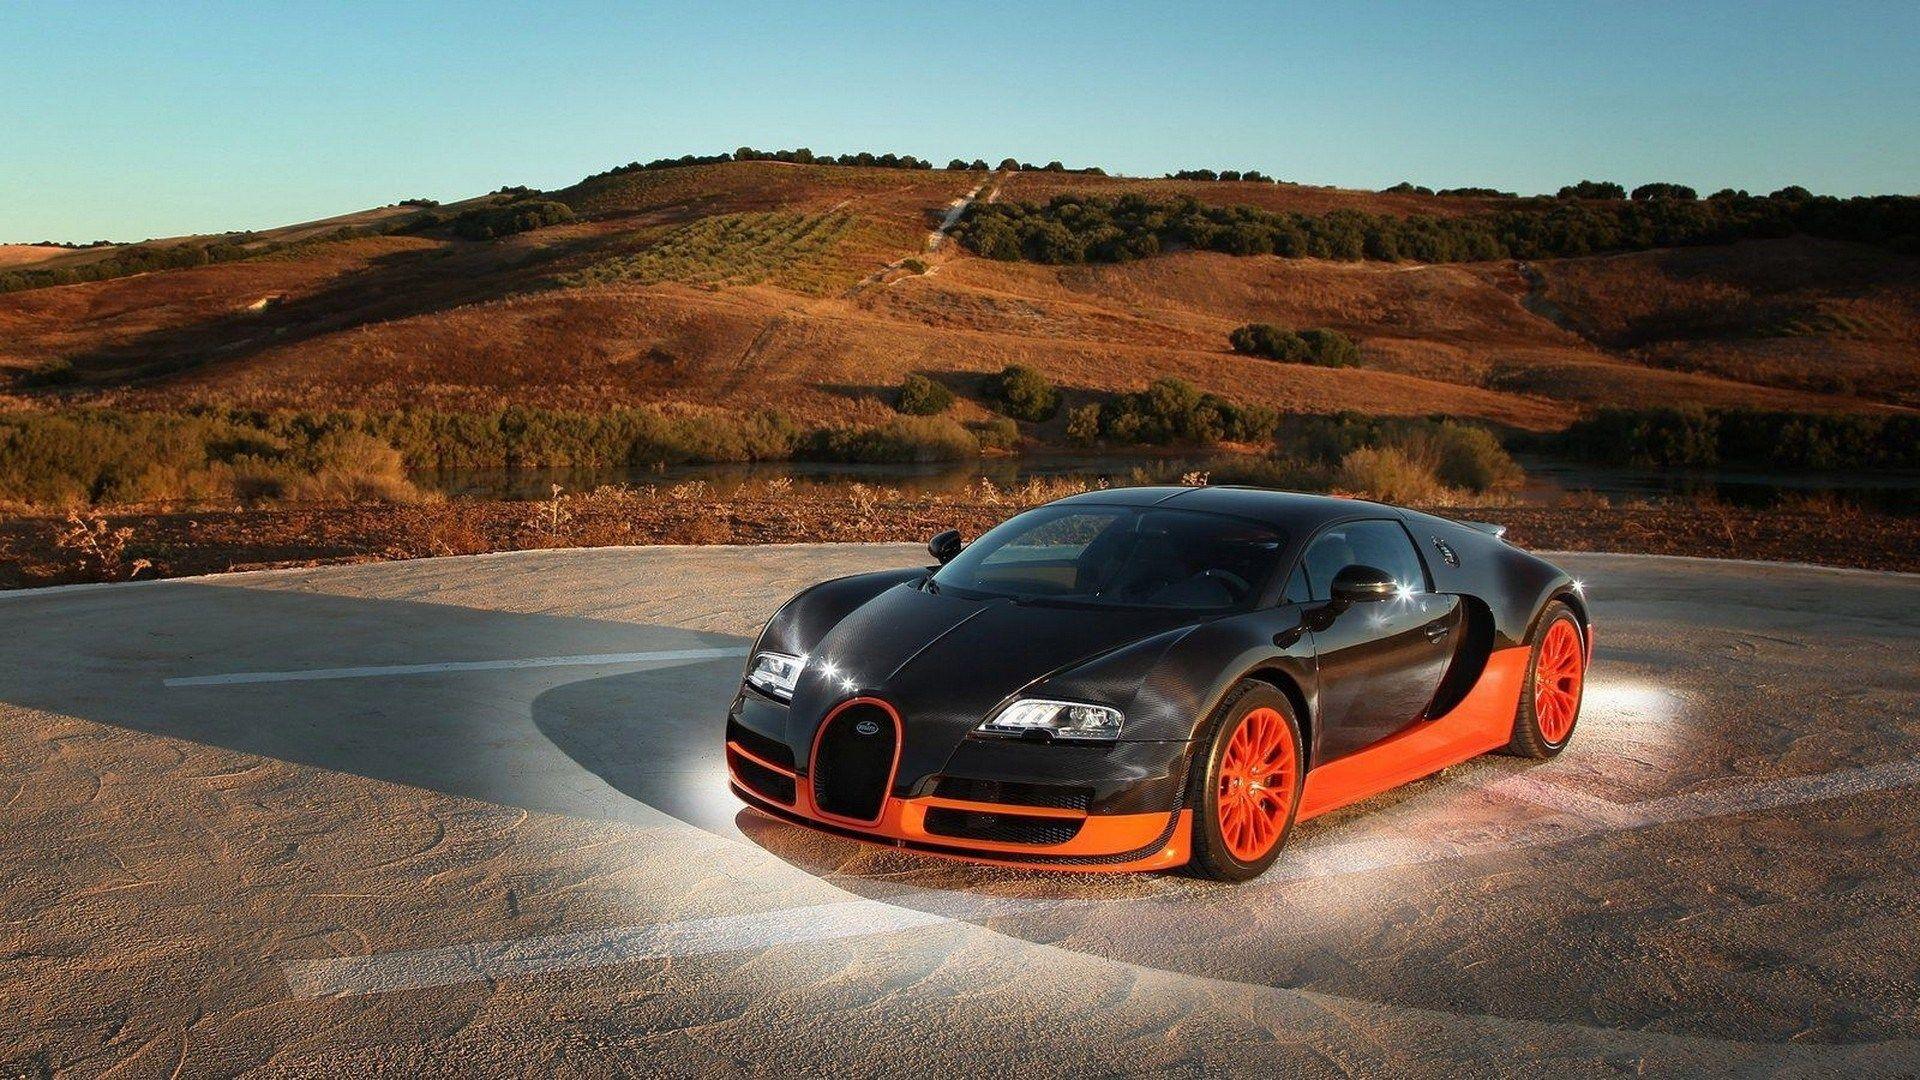 68d280cac9346a727208fcc86aab6968 Terrific Bugatti Veyron 16.4 Grand Sport Vitesse Prix Cars Trend